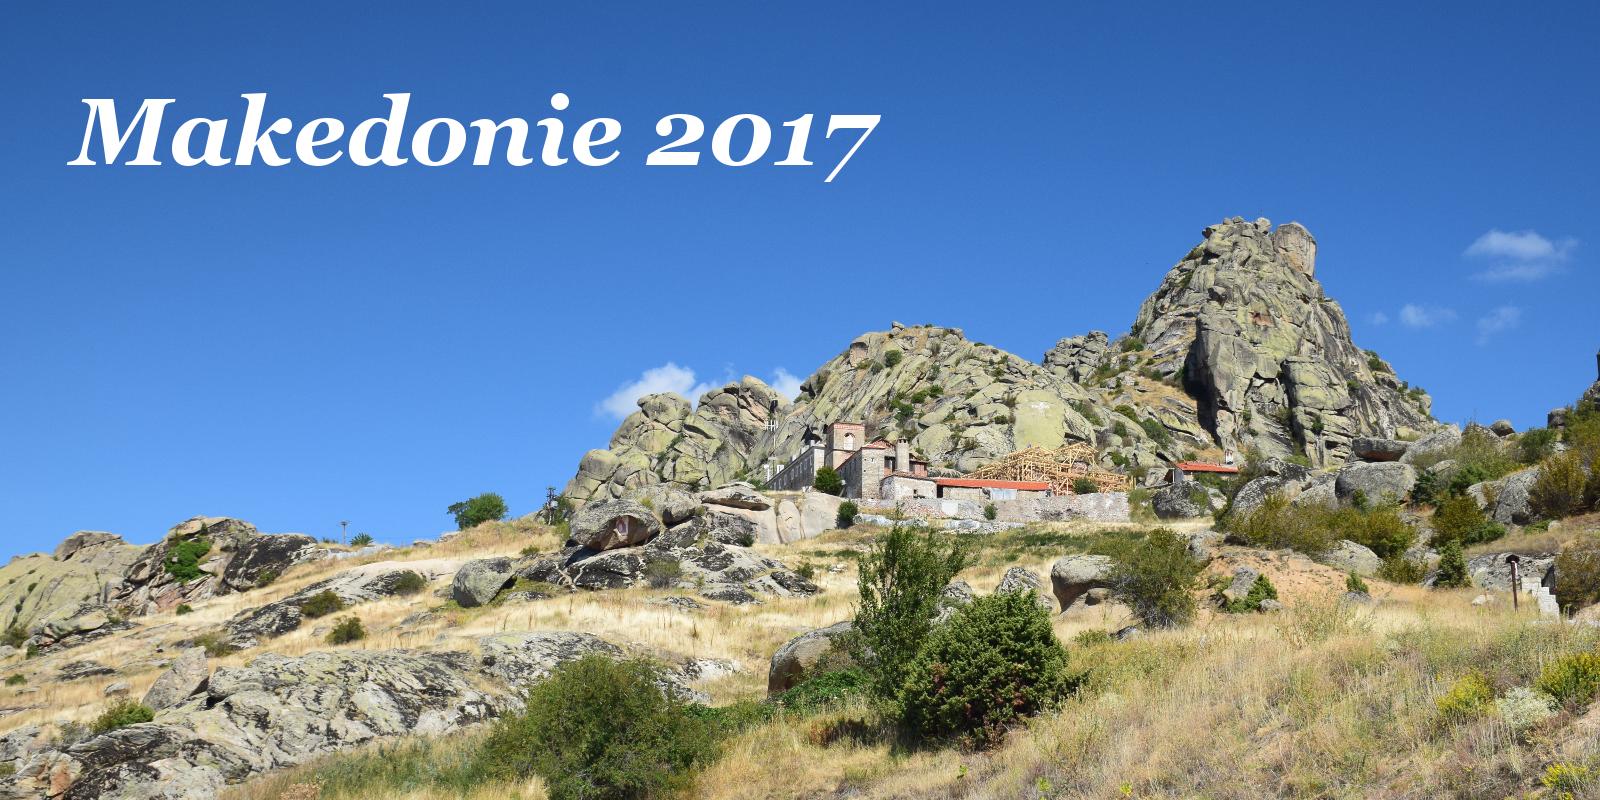 Makedonie 2017